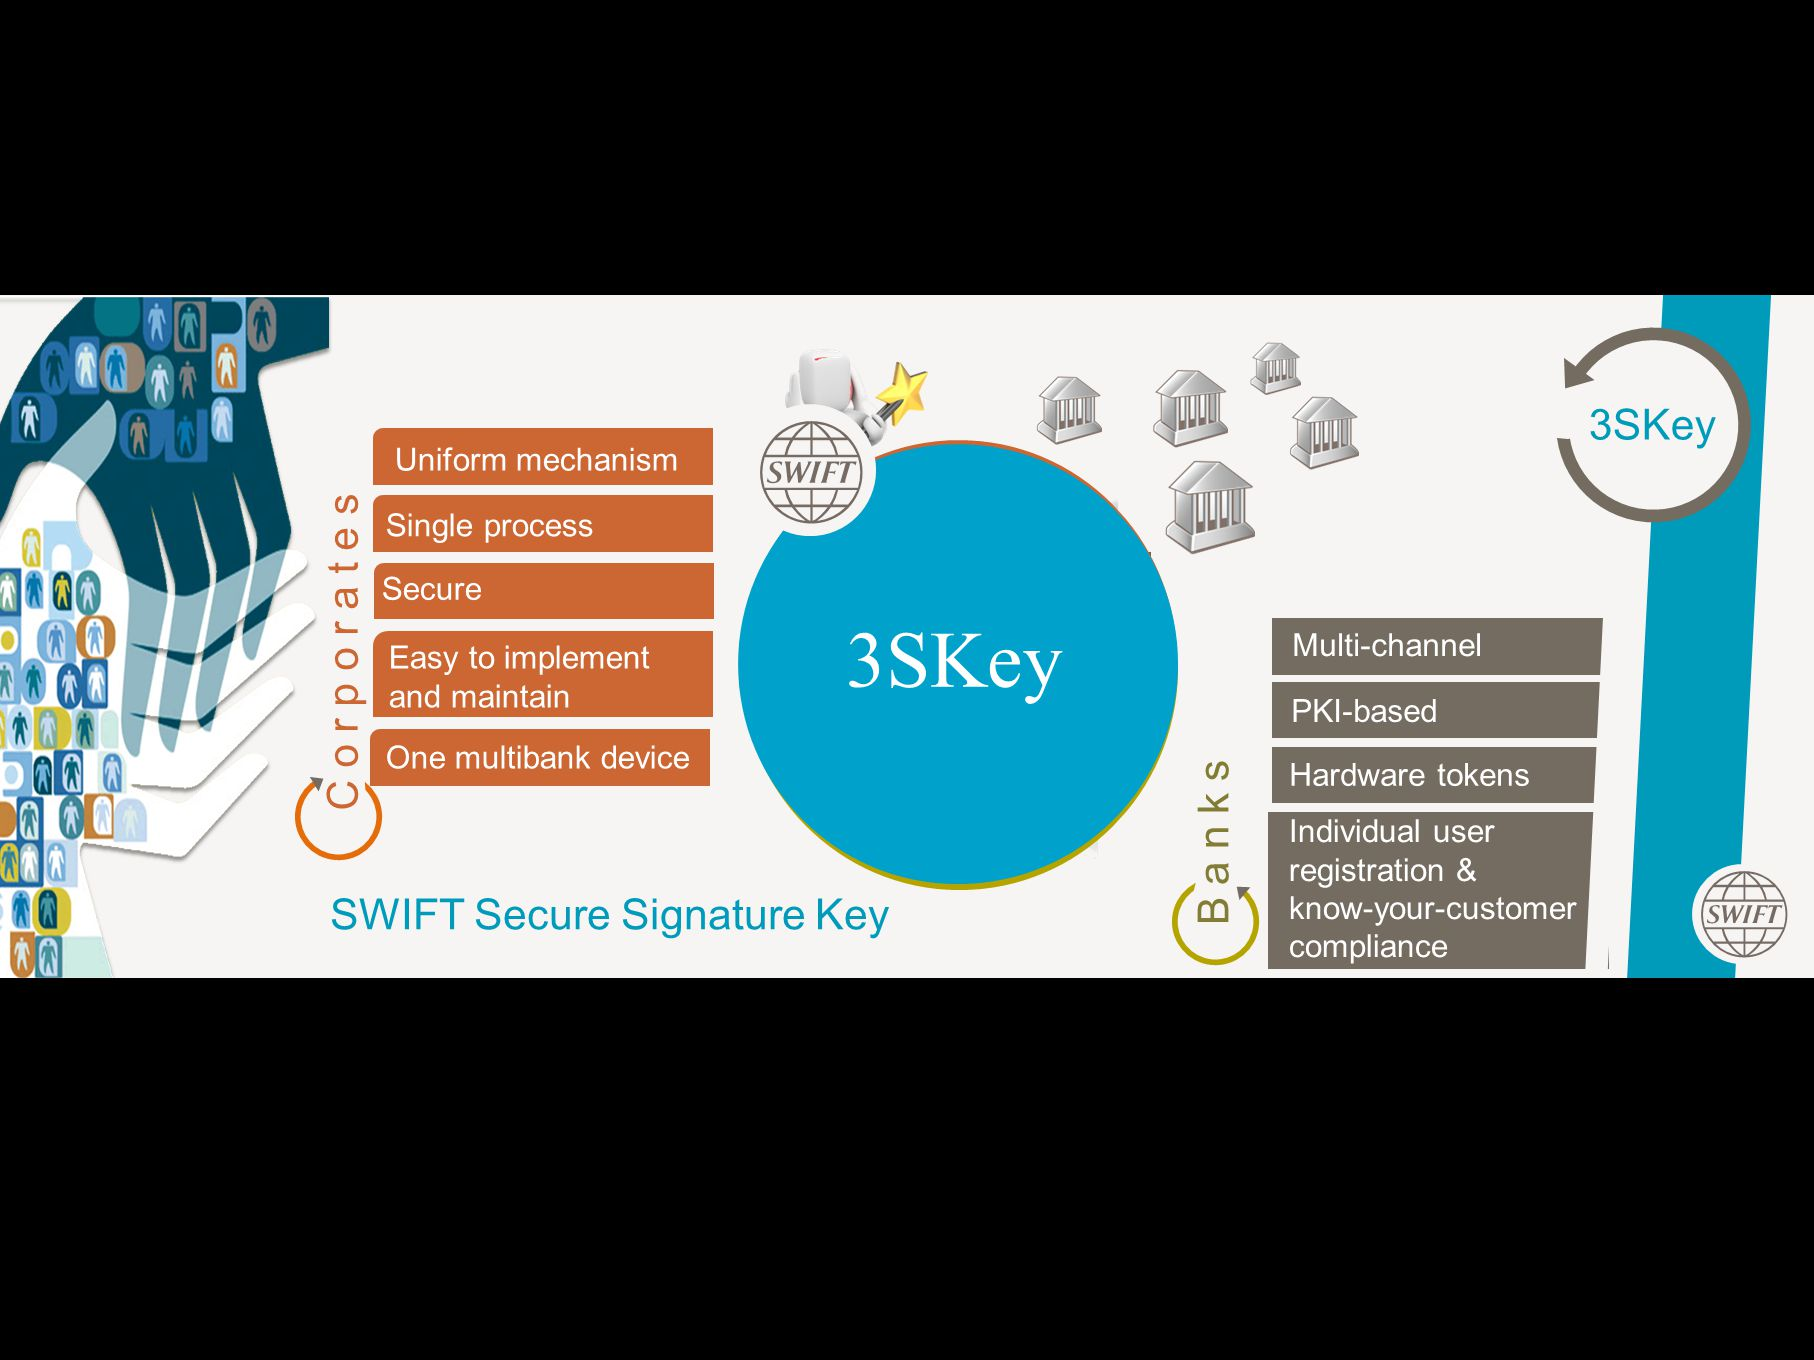 3SKey 3SKey C o r p o r a t e s B a n k s SWIFT Secure Signature Key